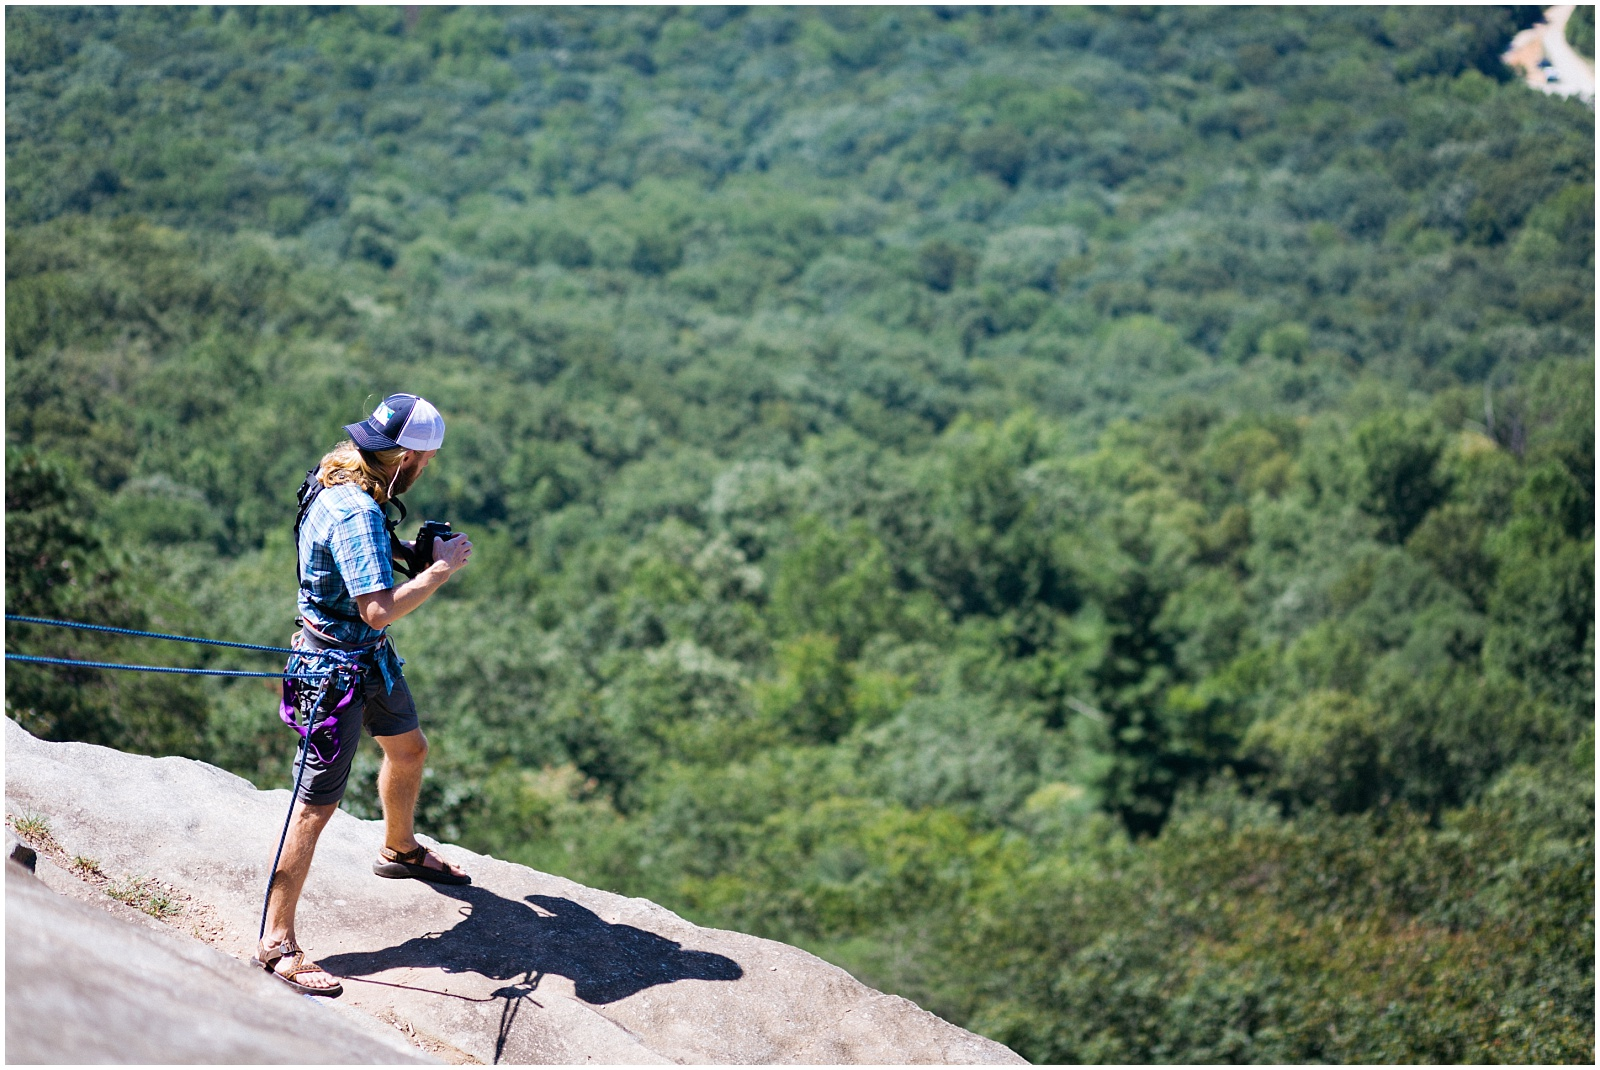 Shooting rock climbing